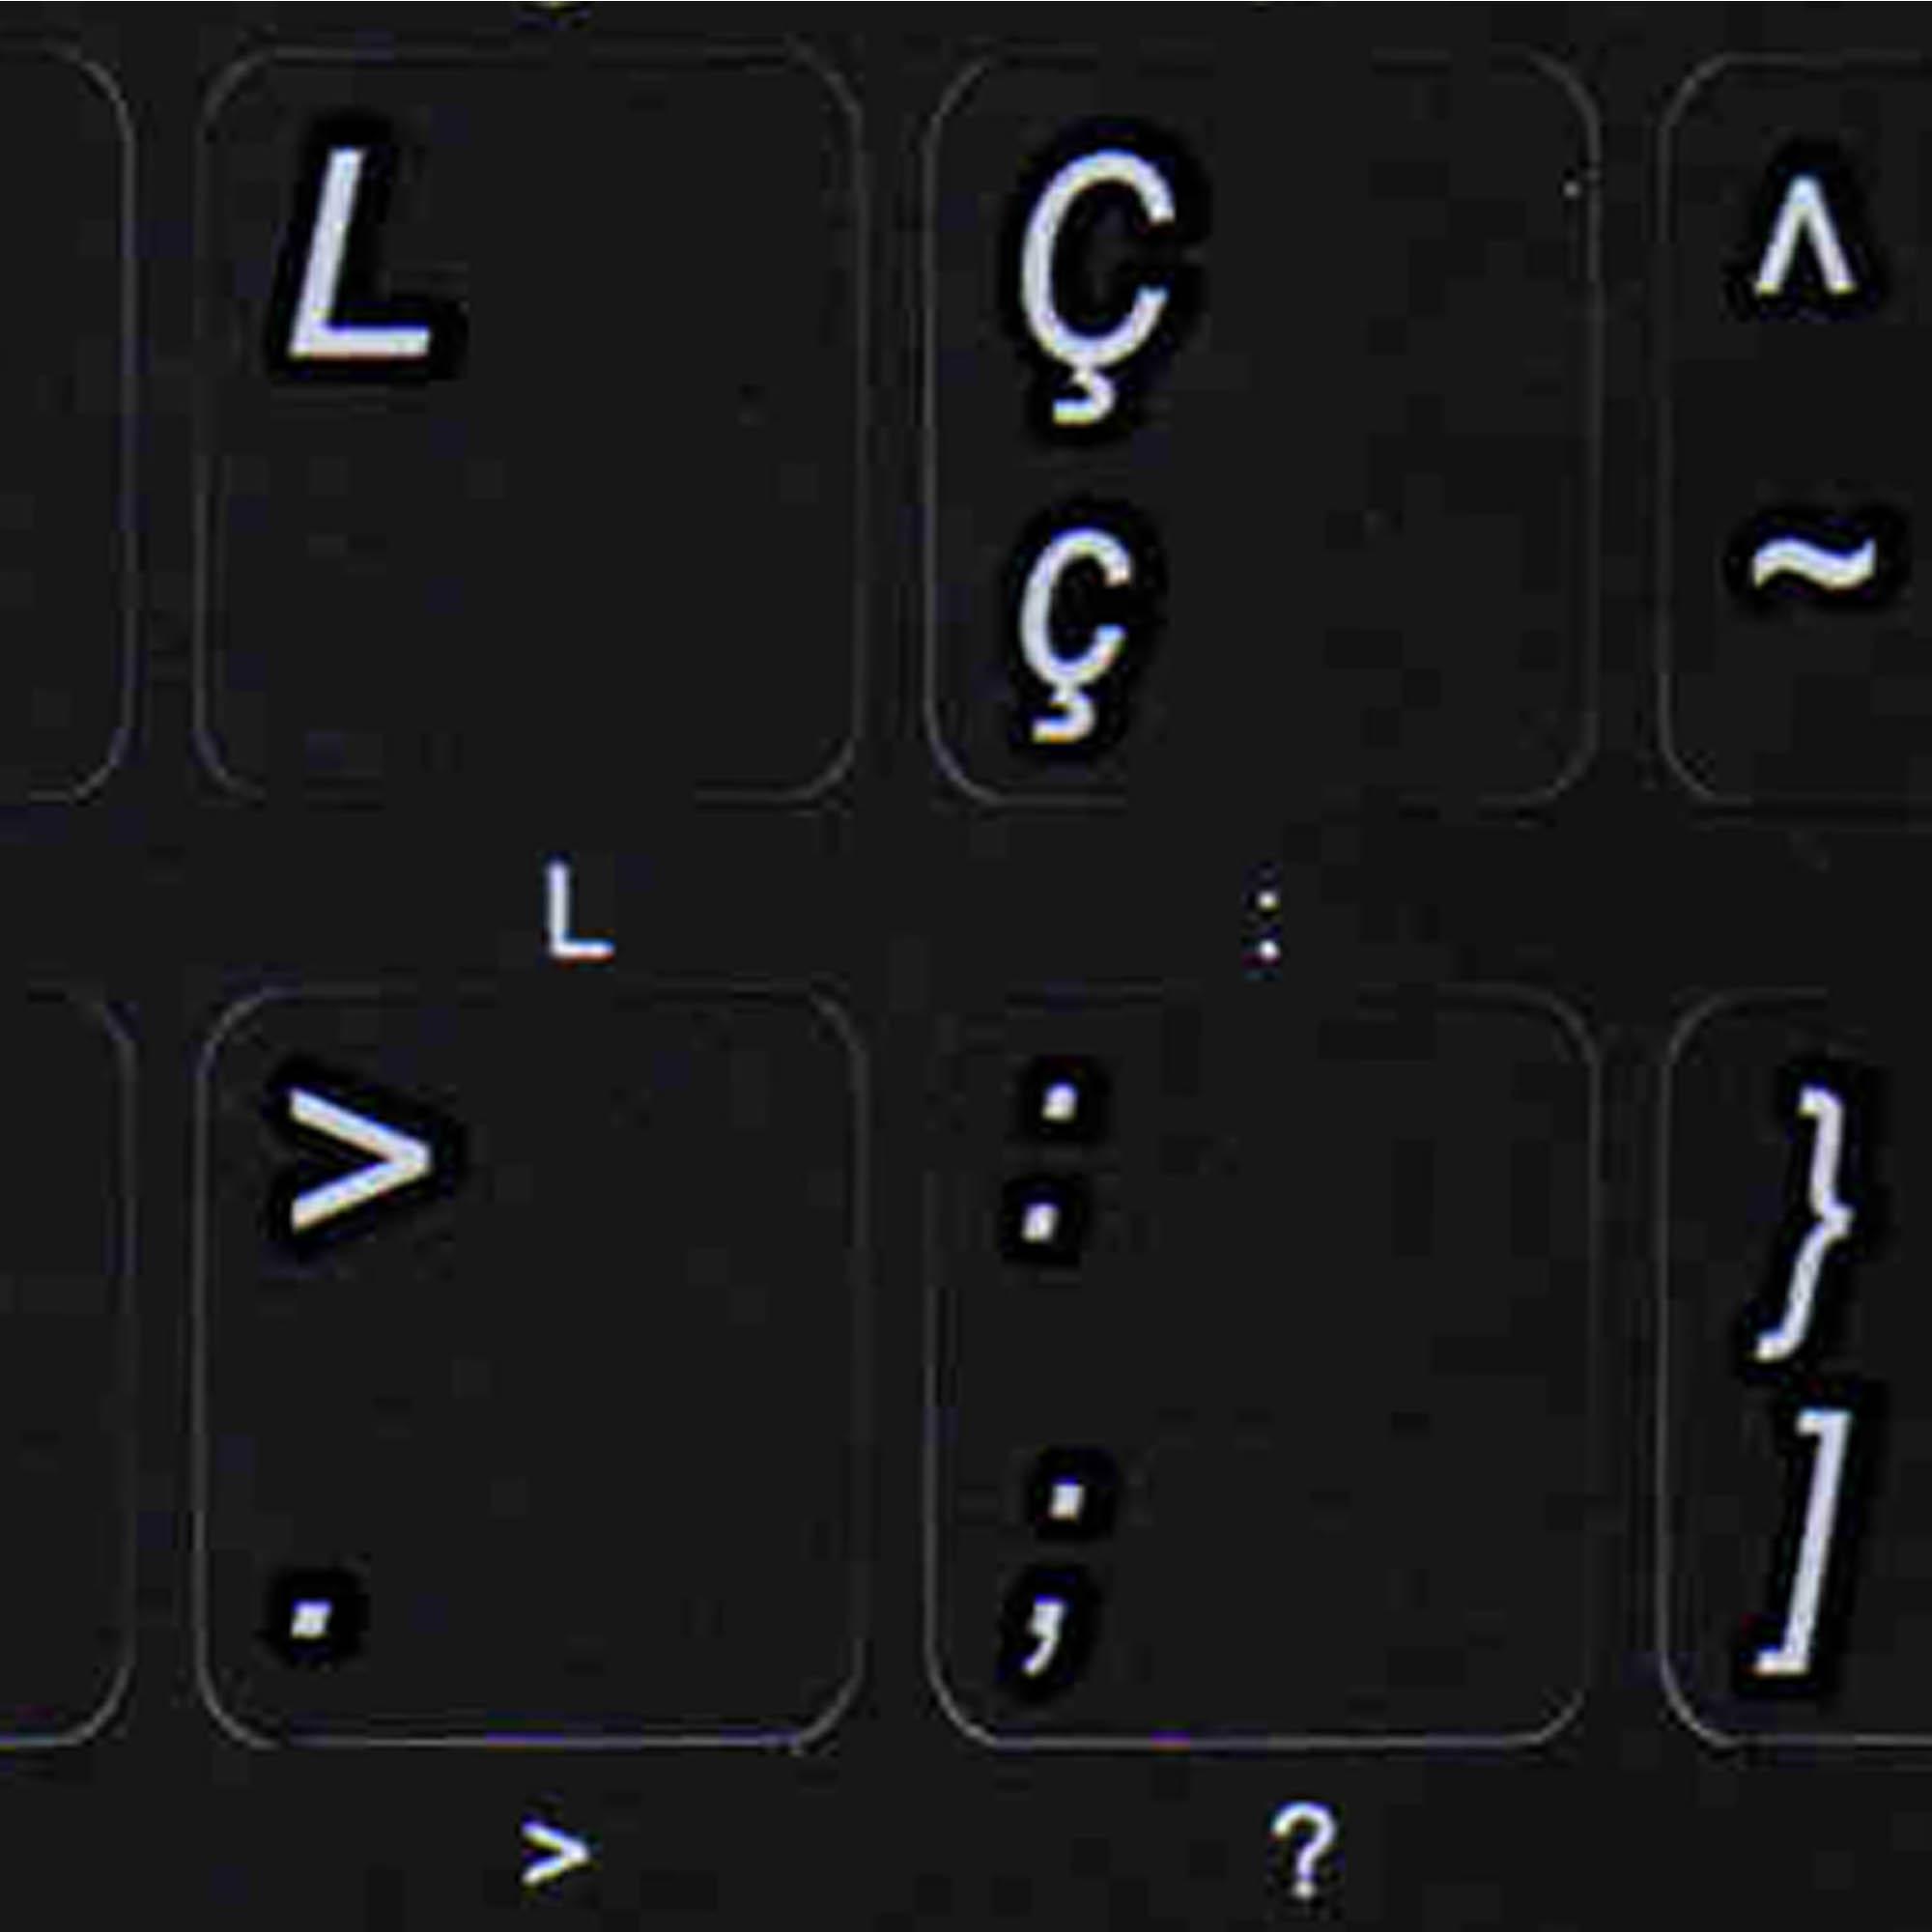 Brazilian Portuguese keyboard stickers non transparent black